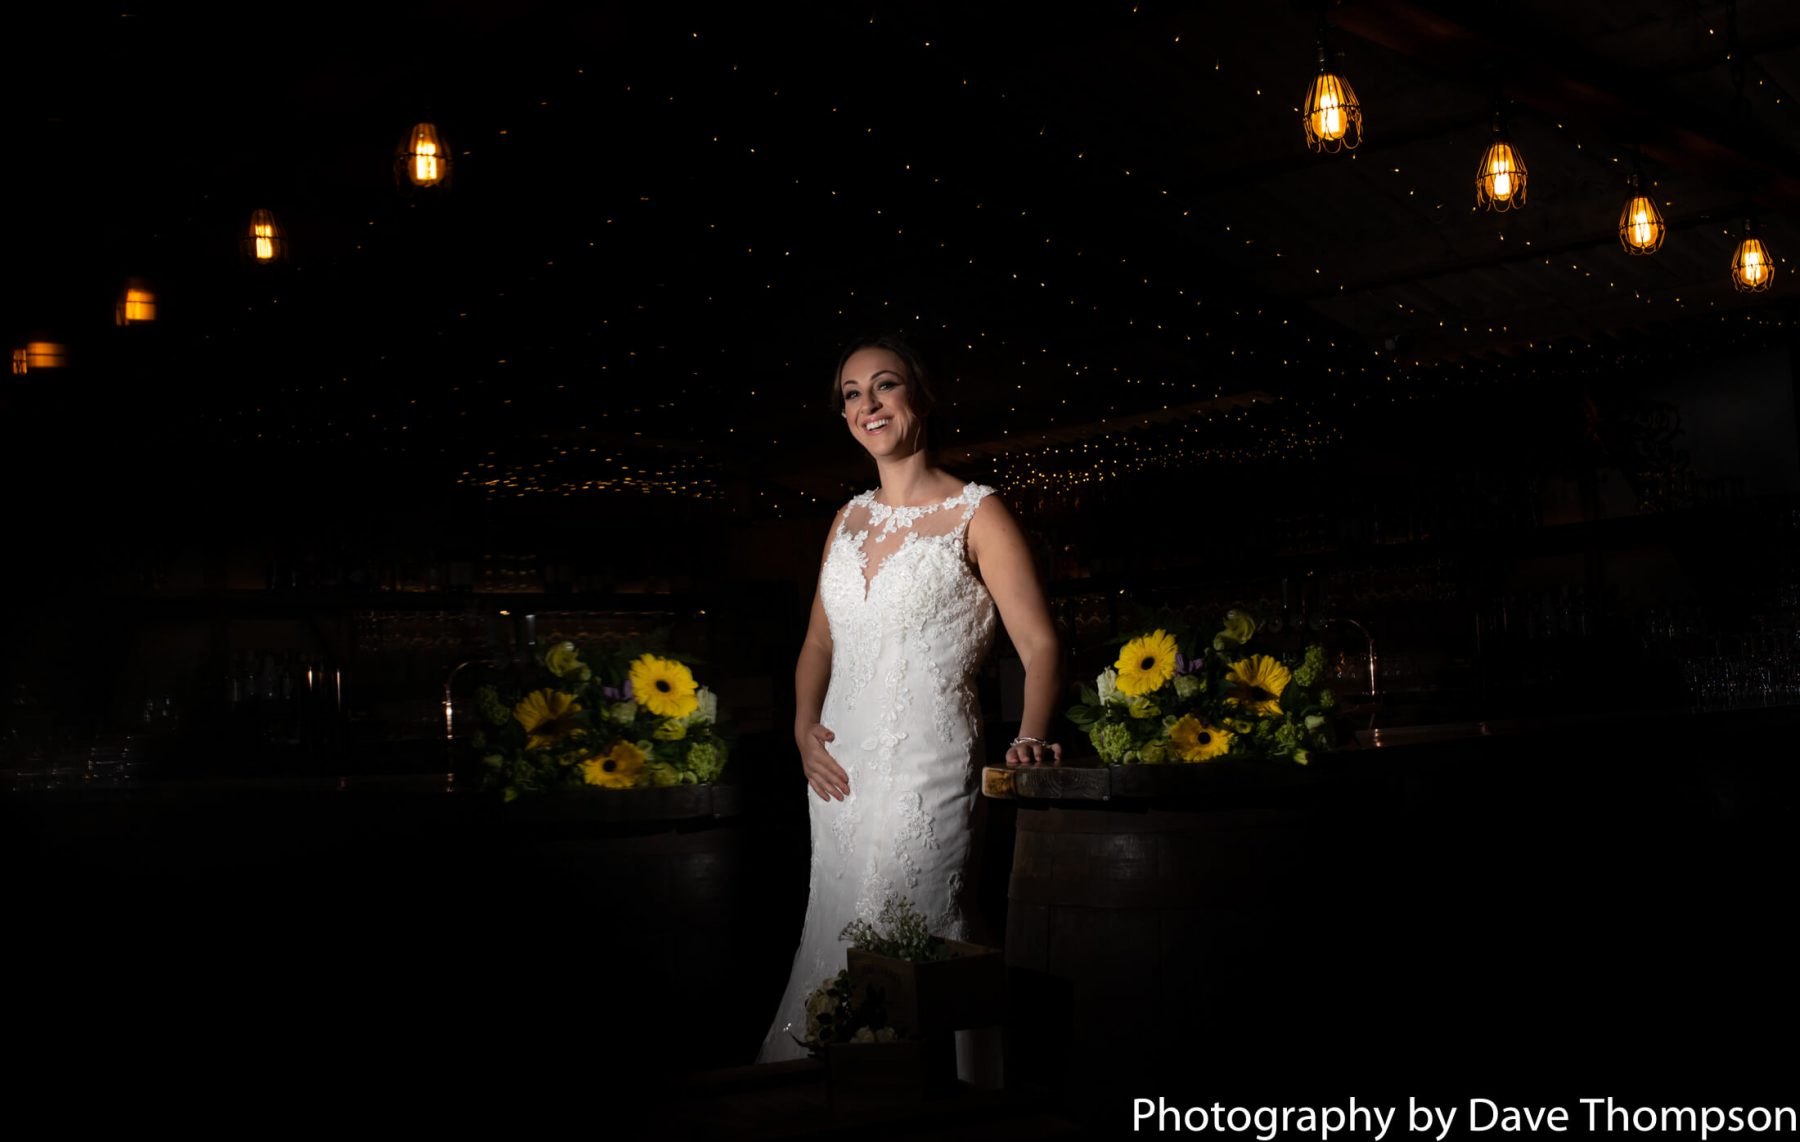 Bridal portrait inside the barn